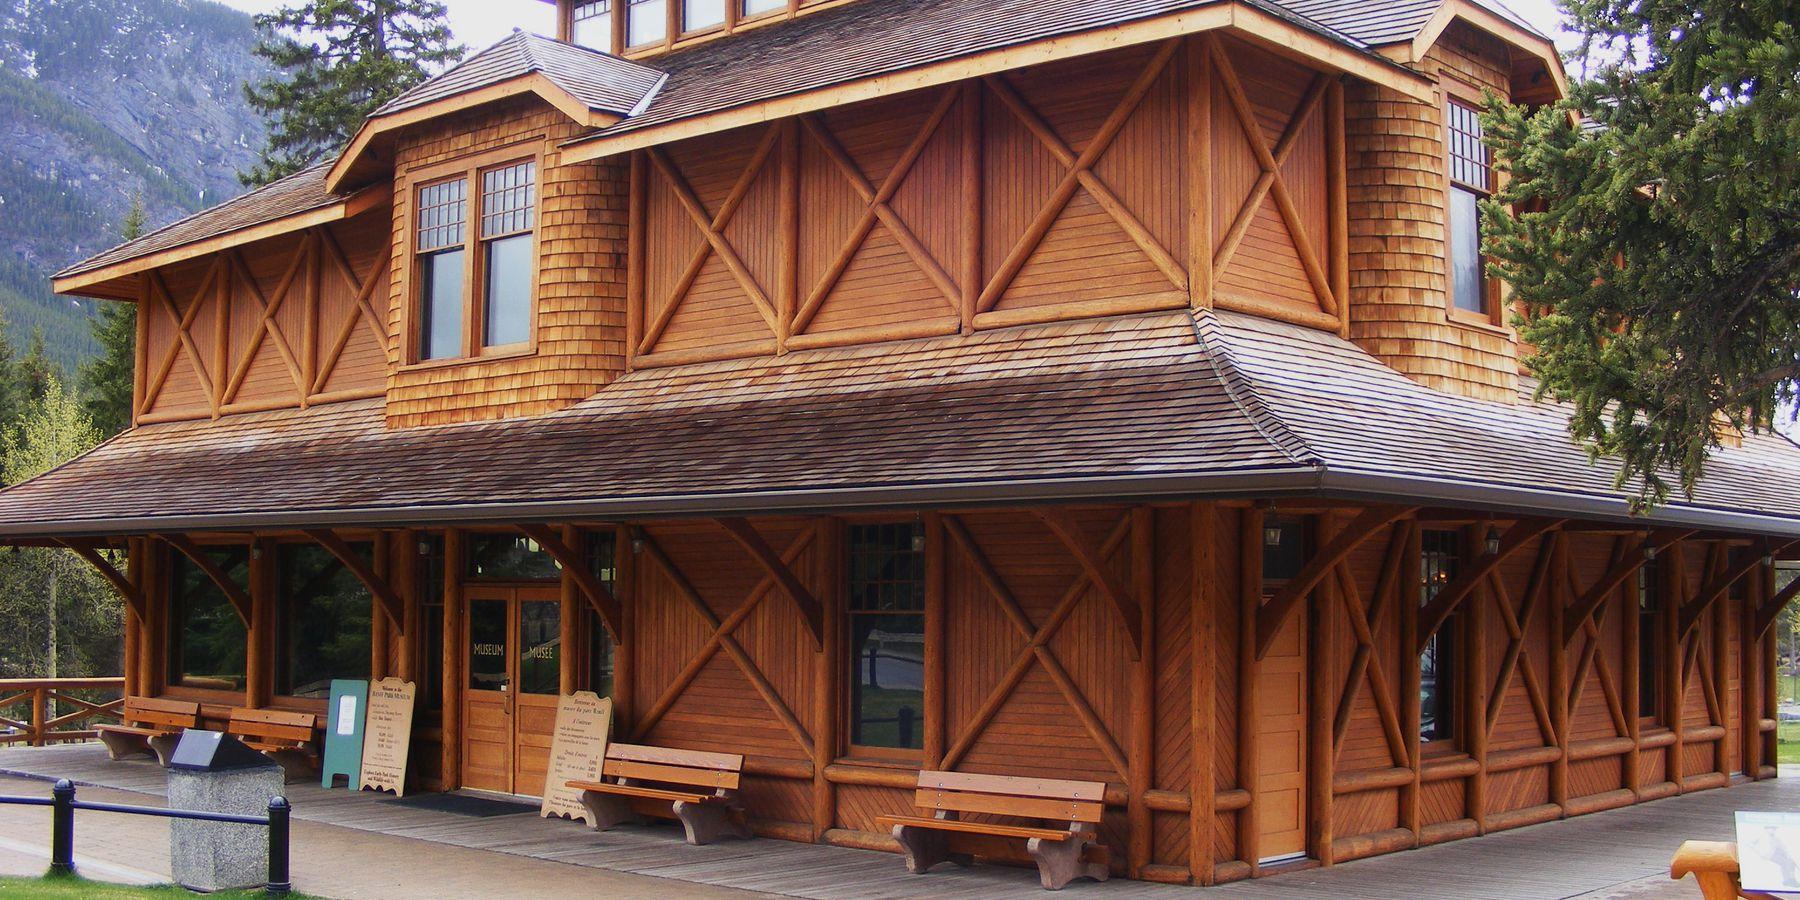 Banff Park Museum - Alberta - Canada - Doets Reizen